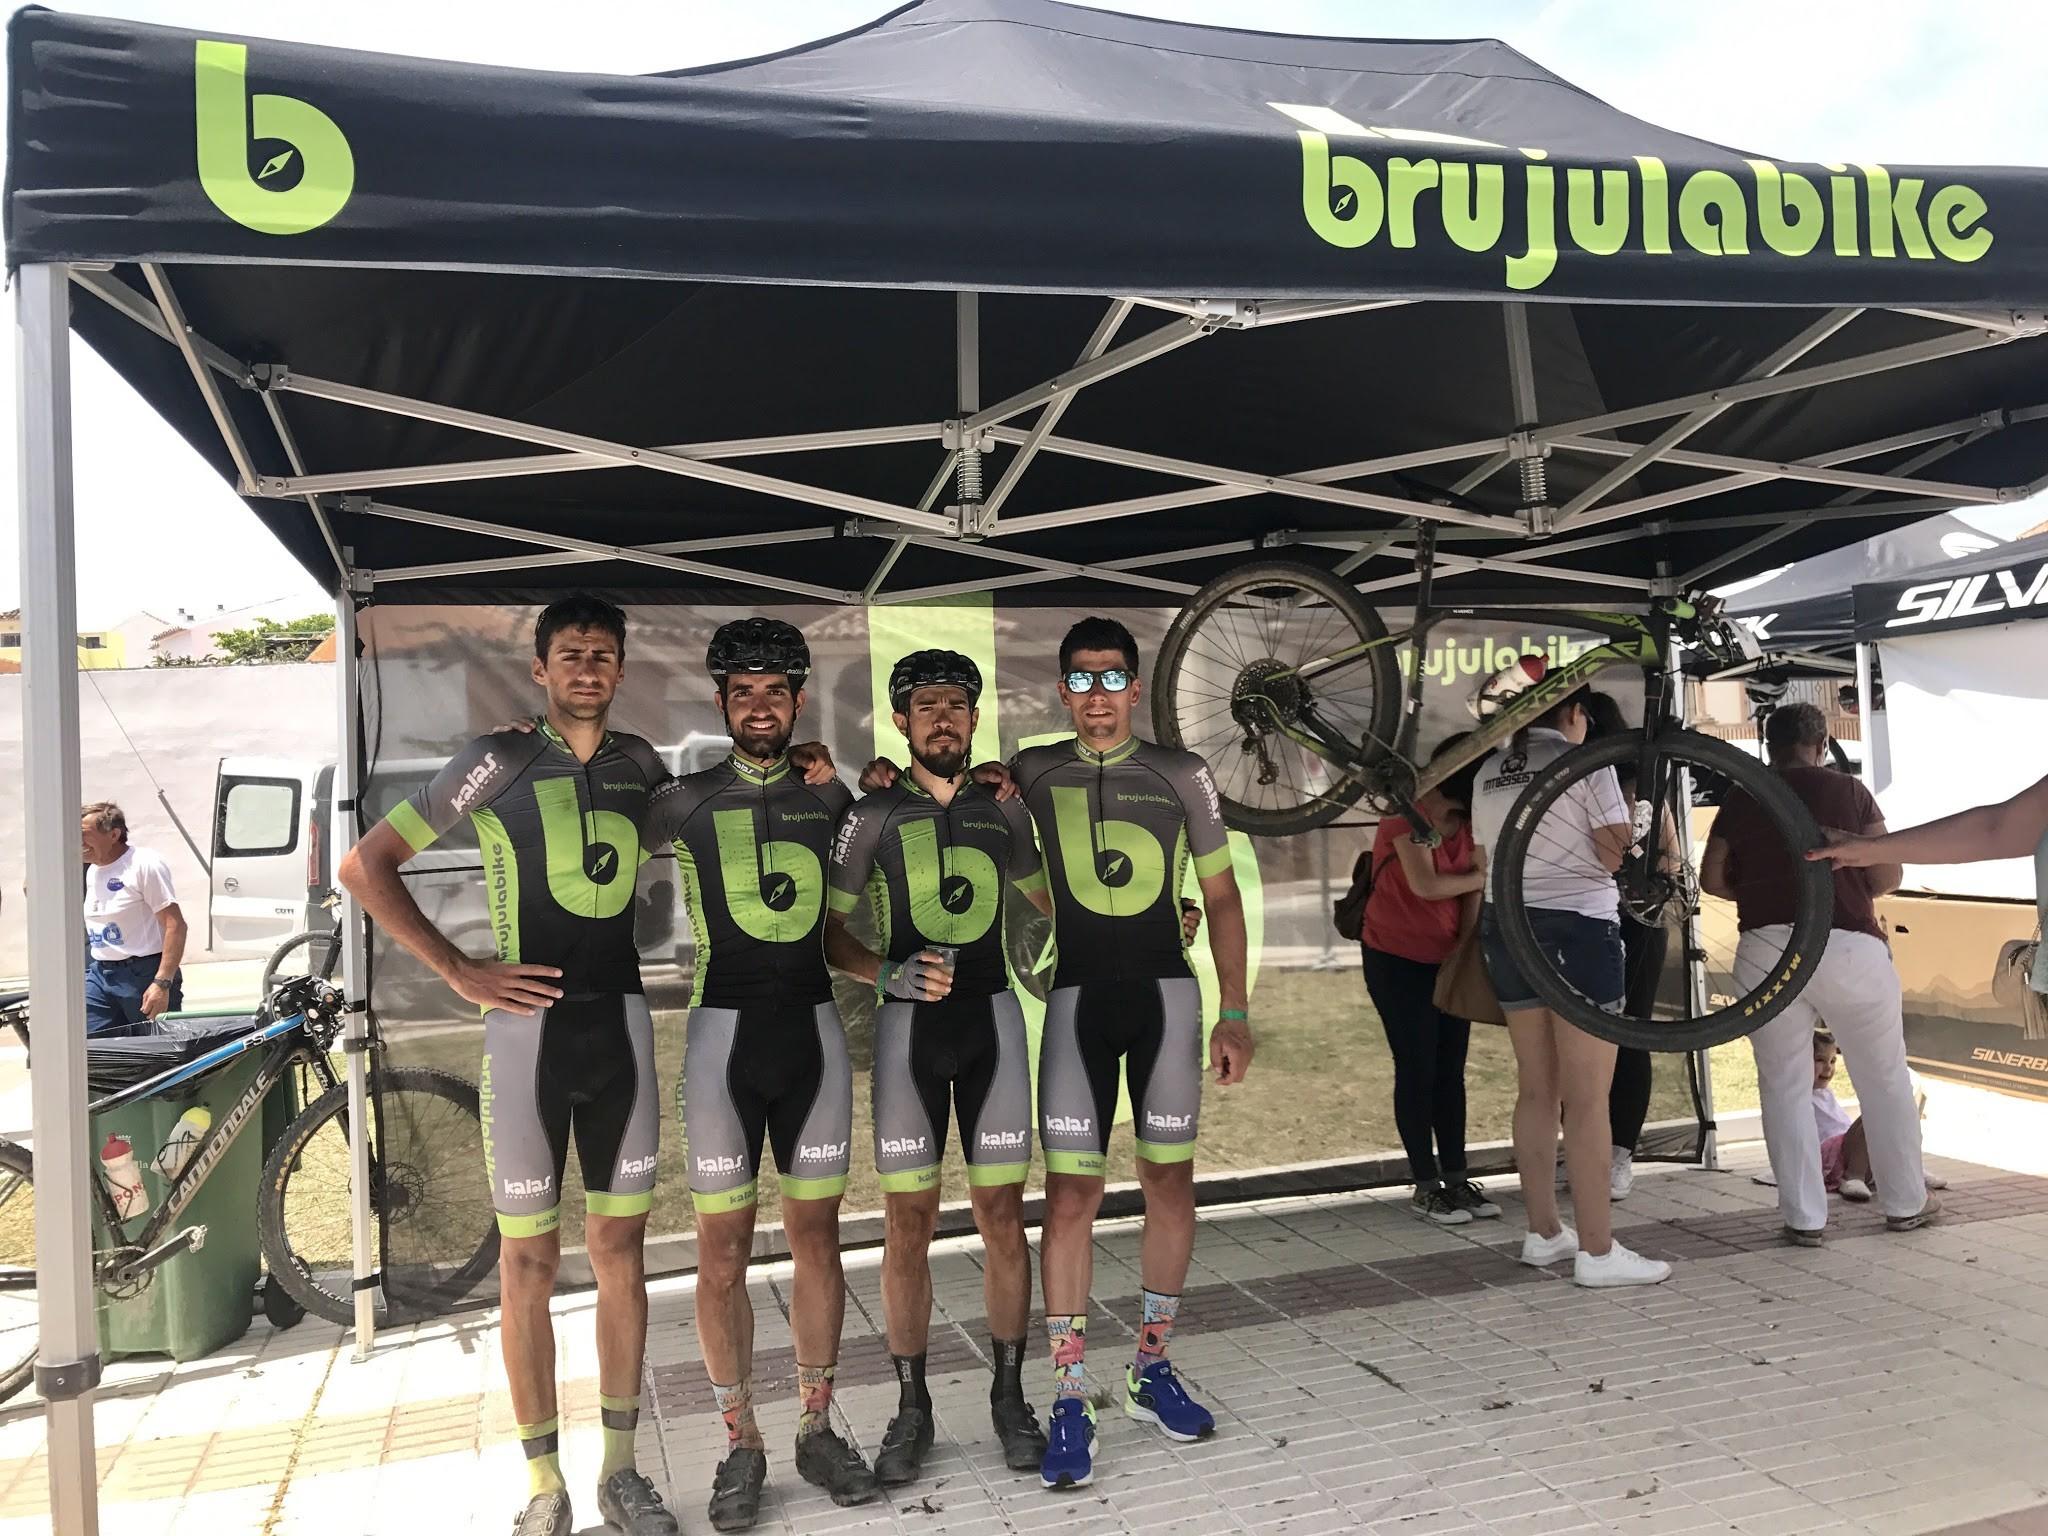 Brujula bike team